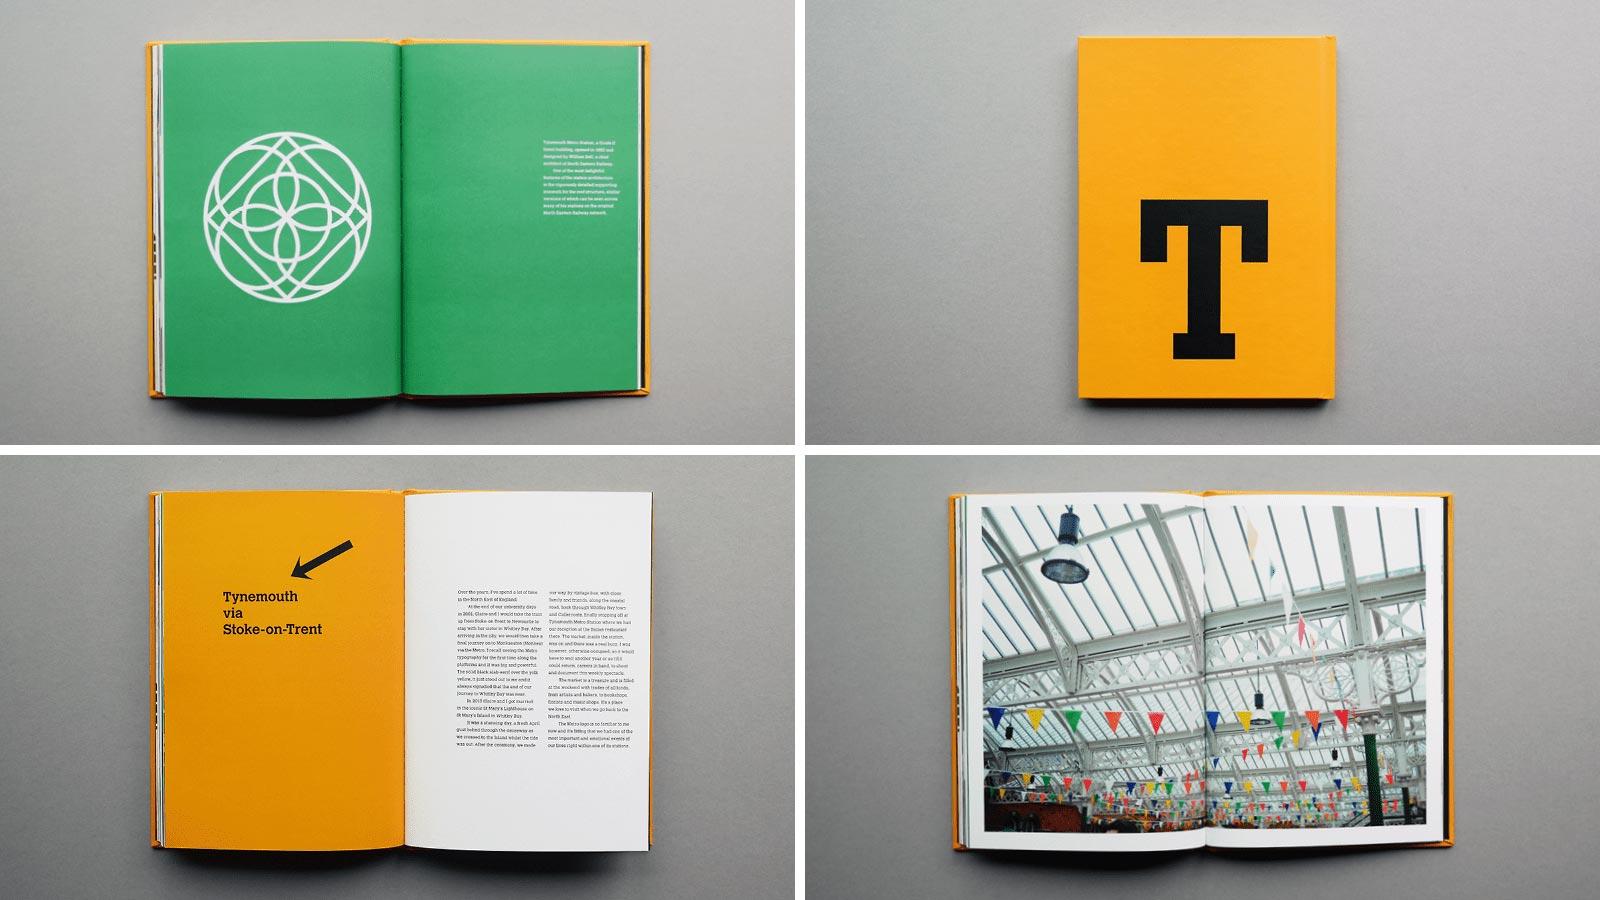 photography-design-picture-book-hard-case-bound-typography-spreads-4xa-milton-keynes-london